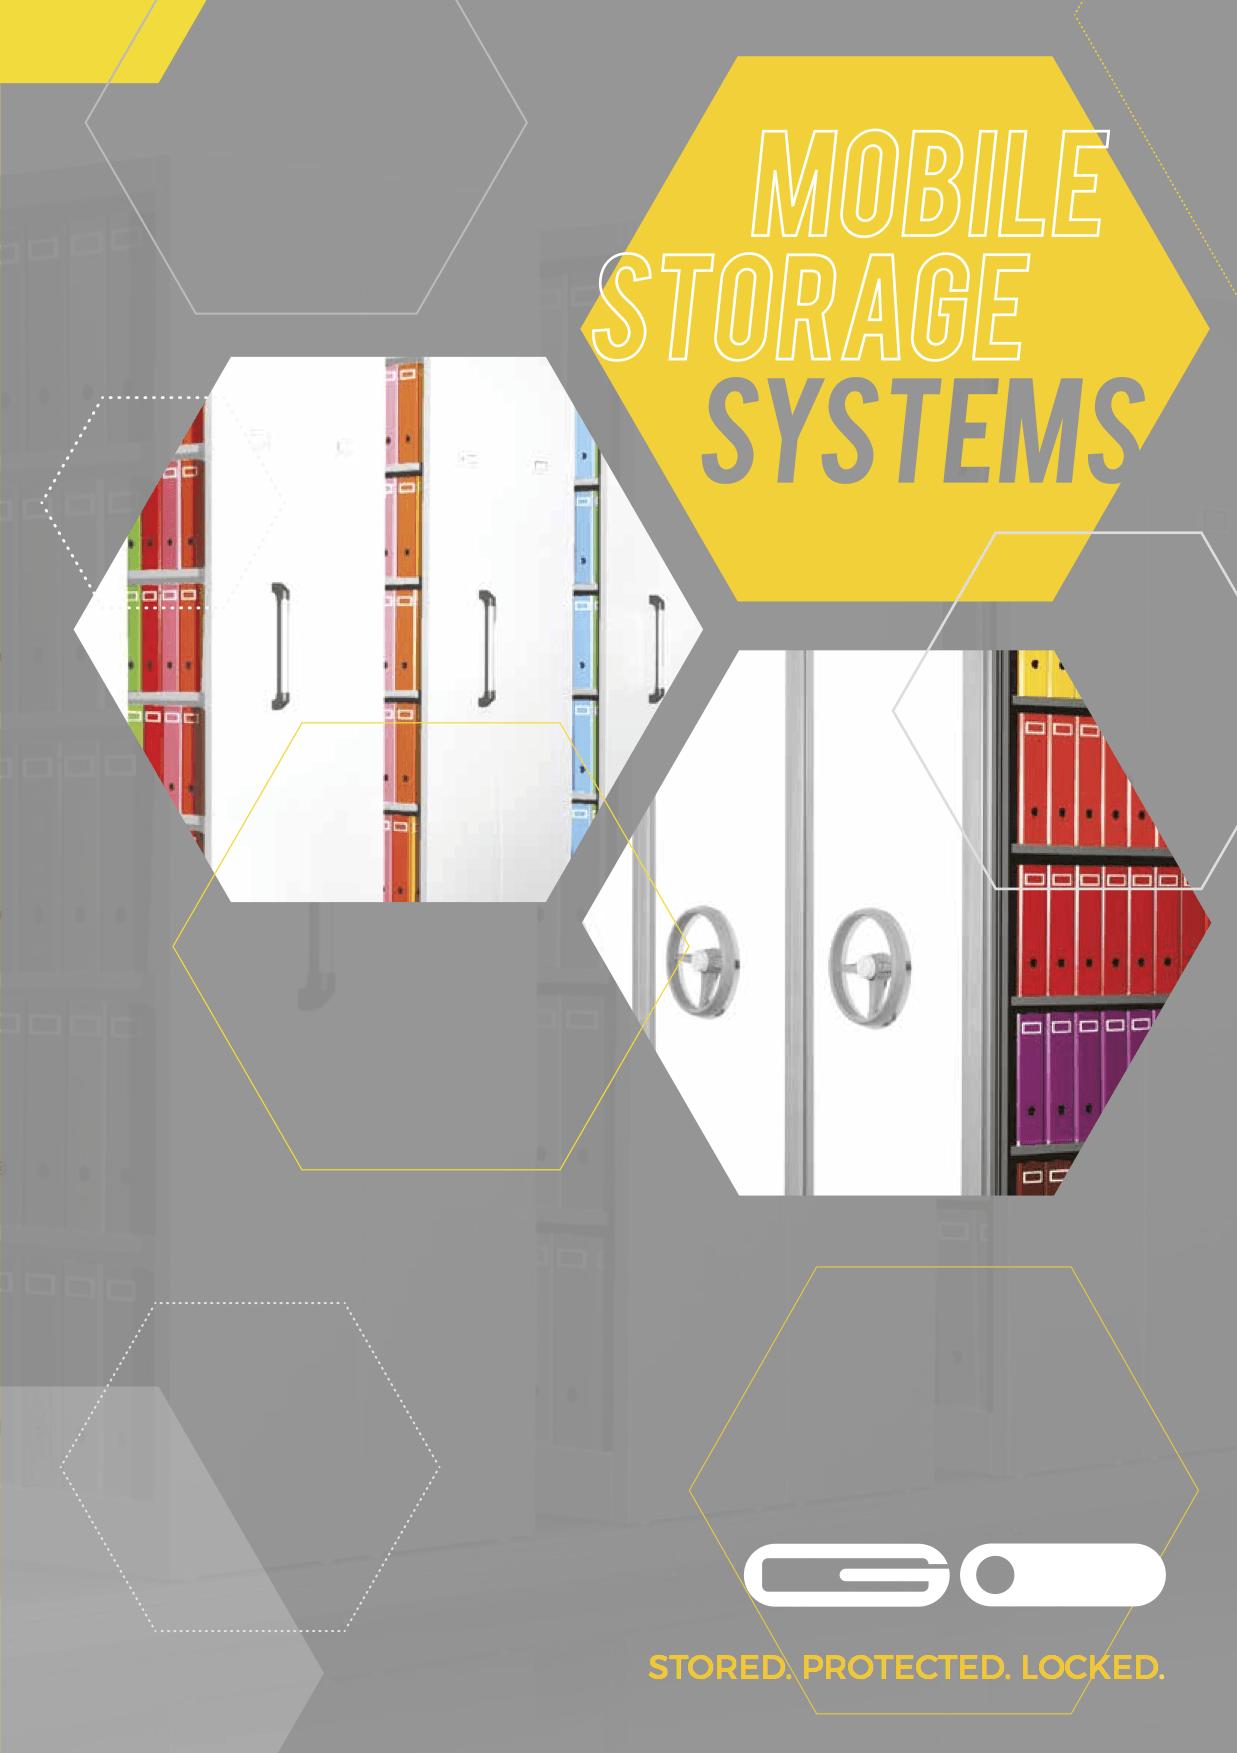 Mobile Storage